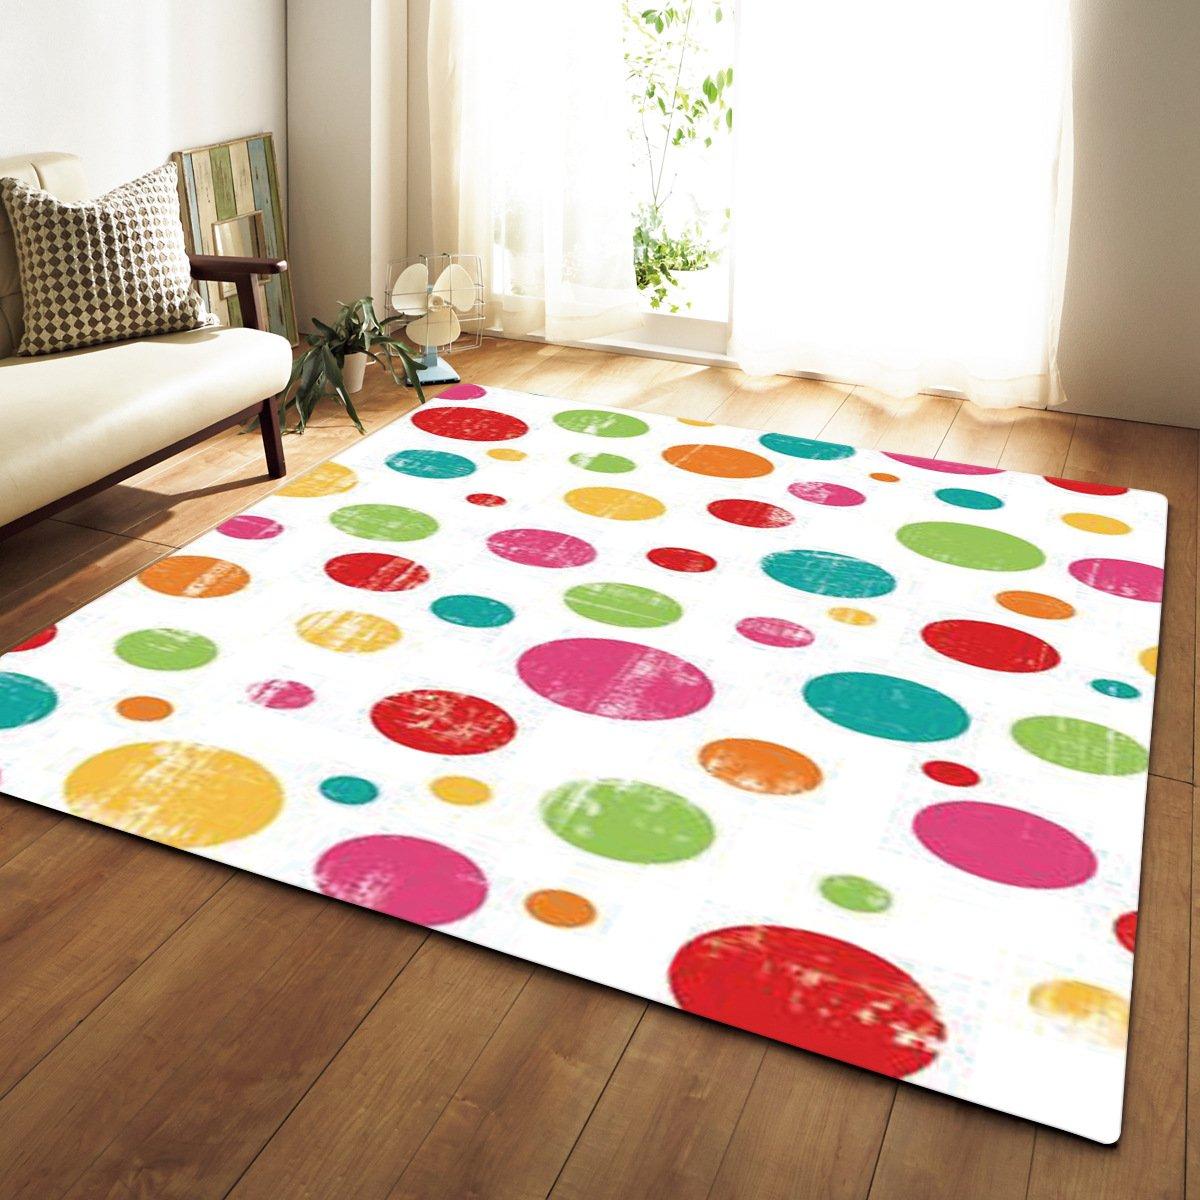 HYRL Carpets Rug 3D Pattern Soft/Rectangular/Anti-Slip Large Size For Living Room Modern Bedroom Tea Table Indoor Mats,#2,120X160cm